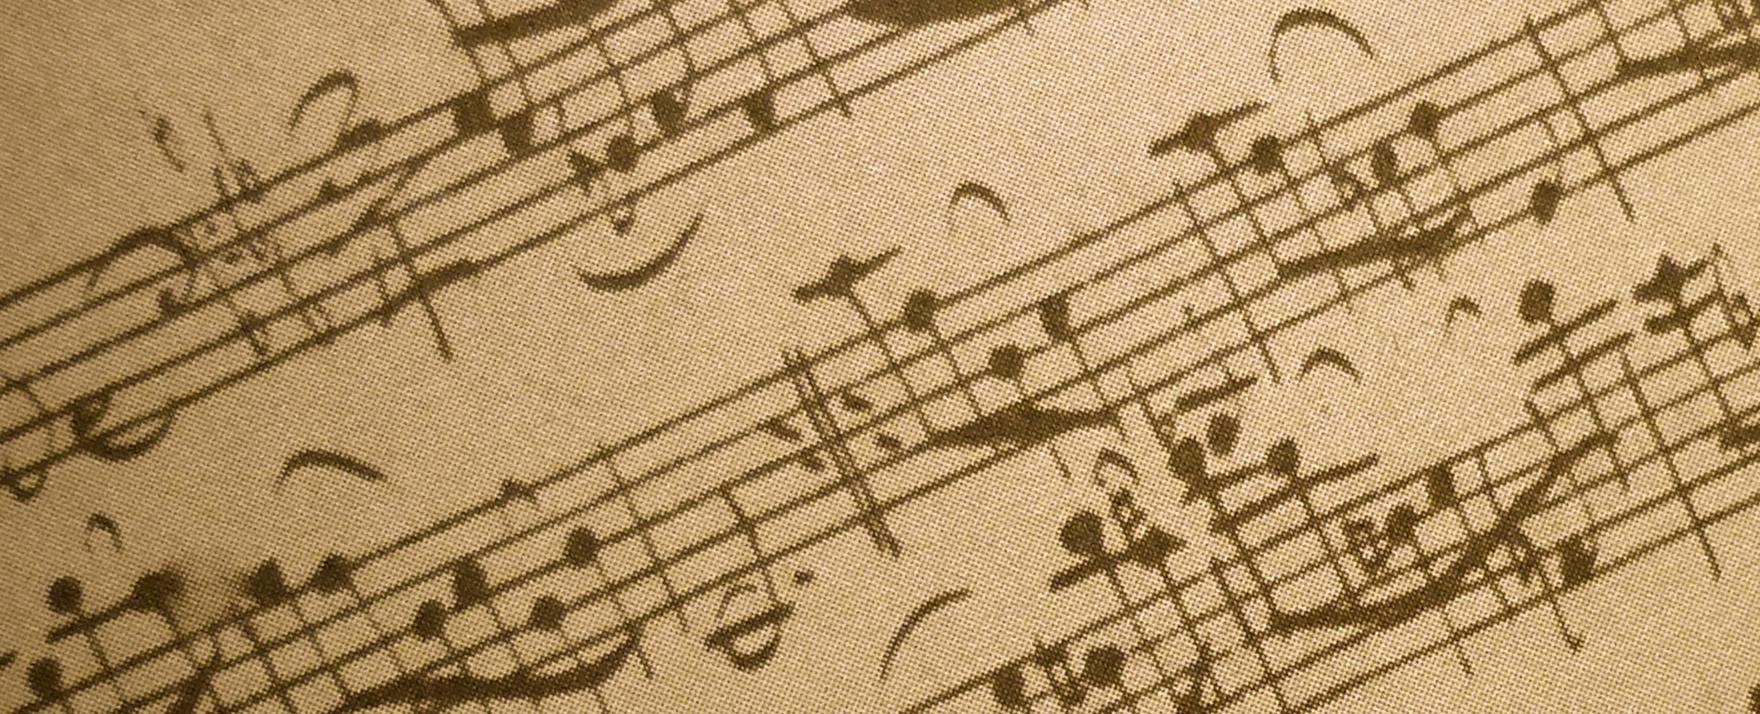 bach sheet music.jpg